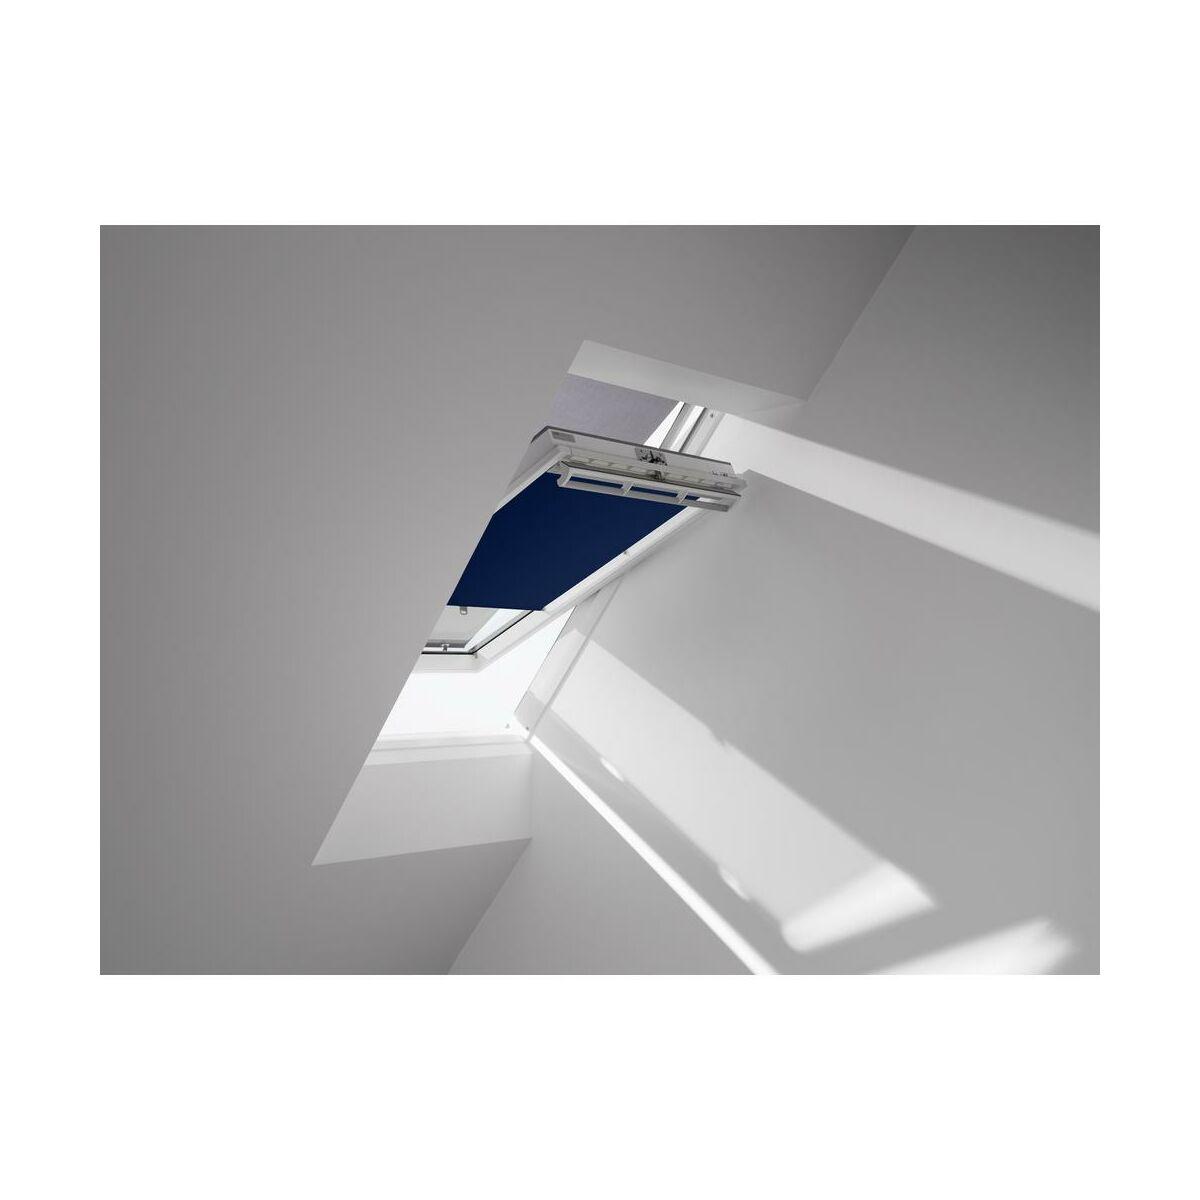 okno dachowe ggu pk08 0060r21 140x94 cm velux sprawd opinie w leroy merlin. Black Bedroom Furniture Sets. Home Design Ideas